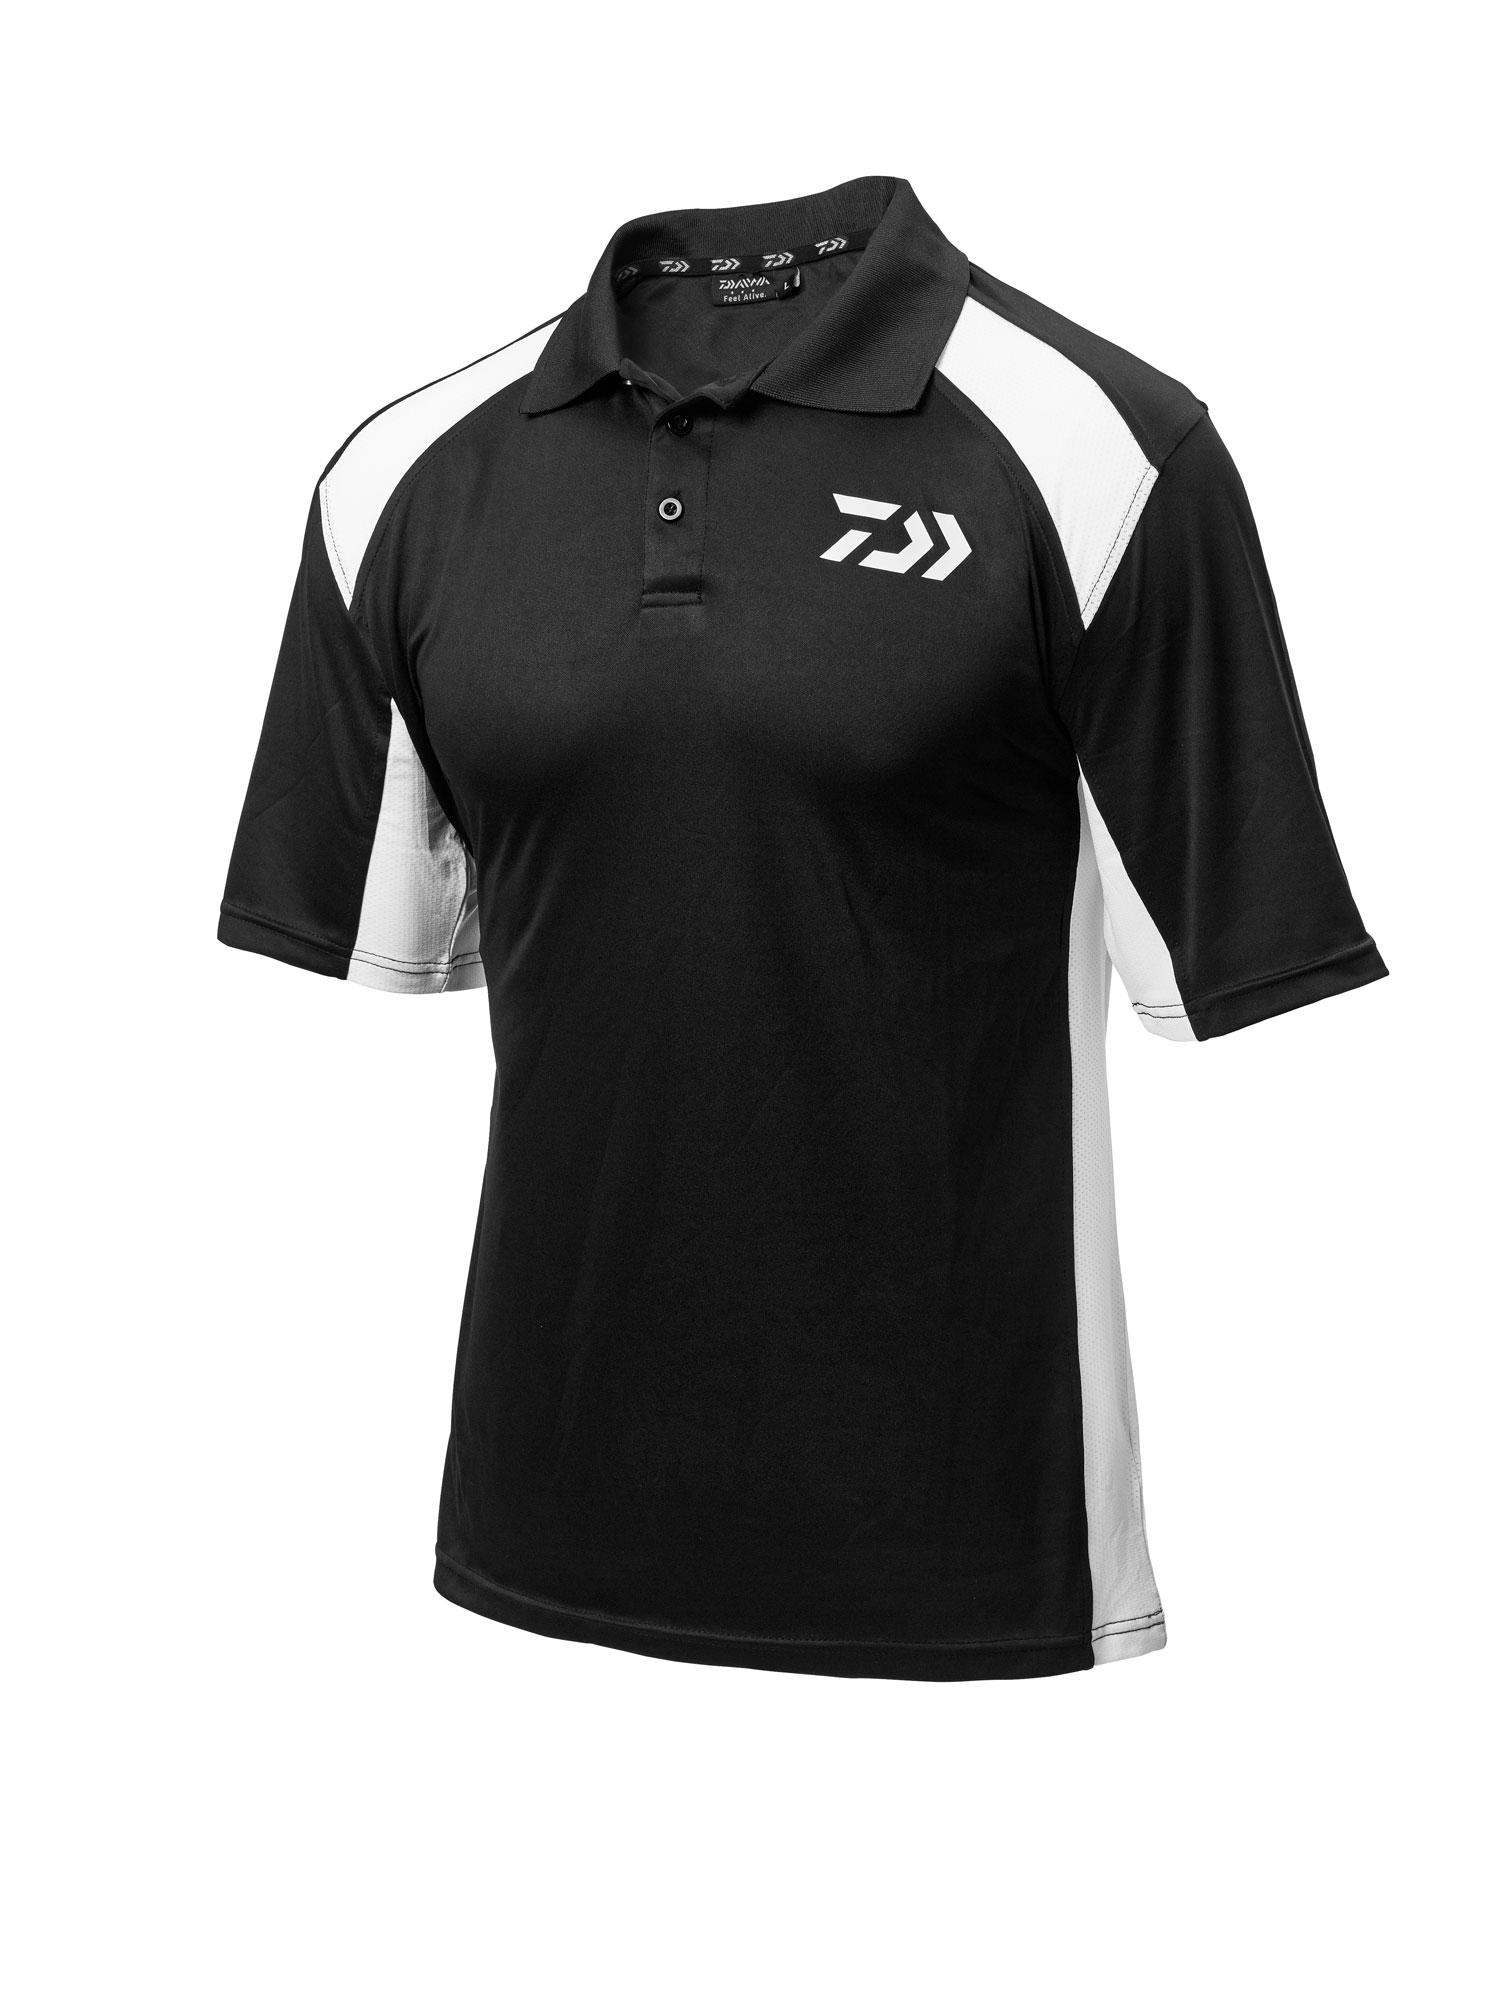 New Daiwa Polo Shirts - Black Red - Black White - Black Blue - Med ... 352151036bbf